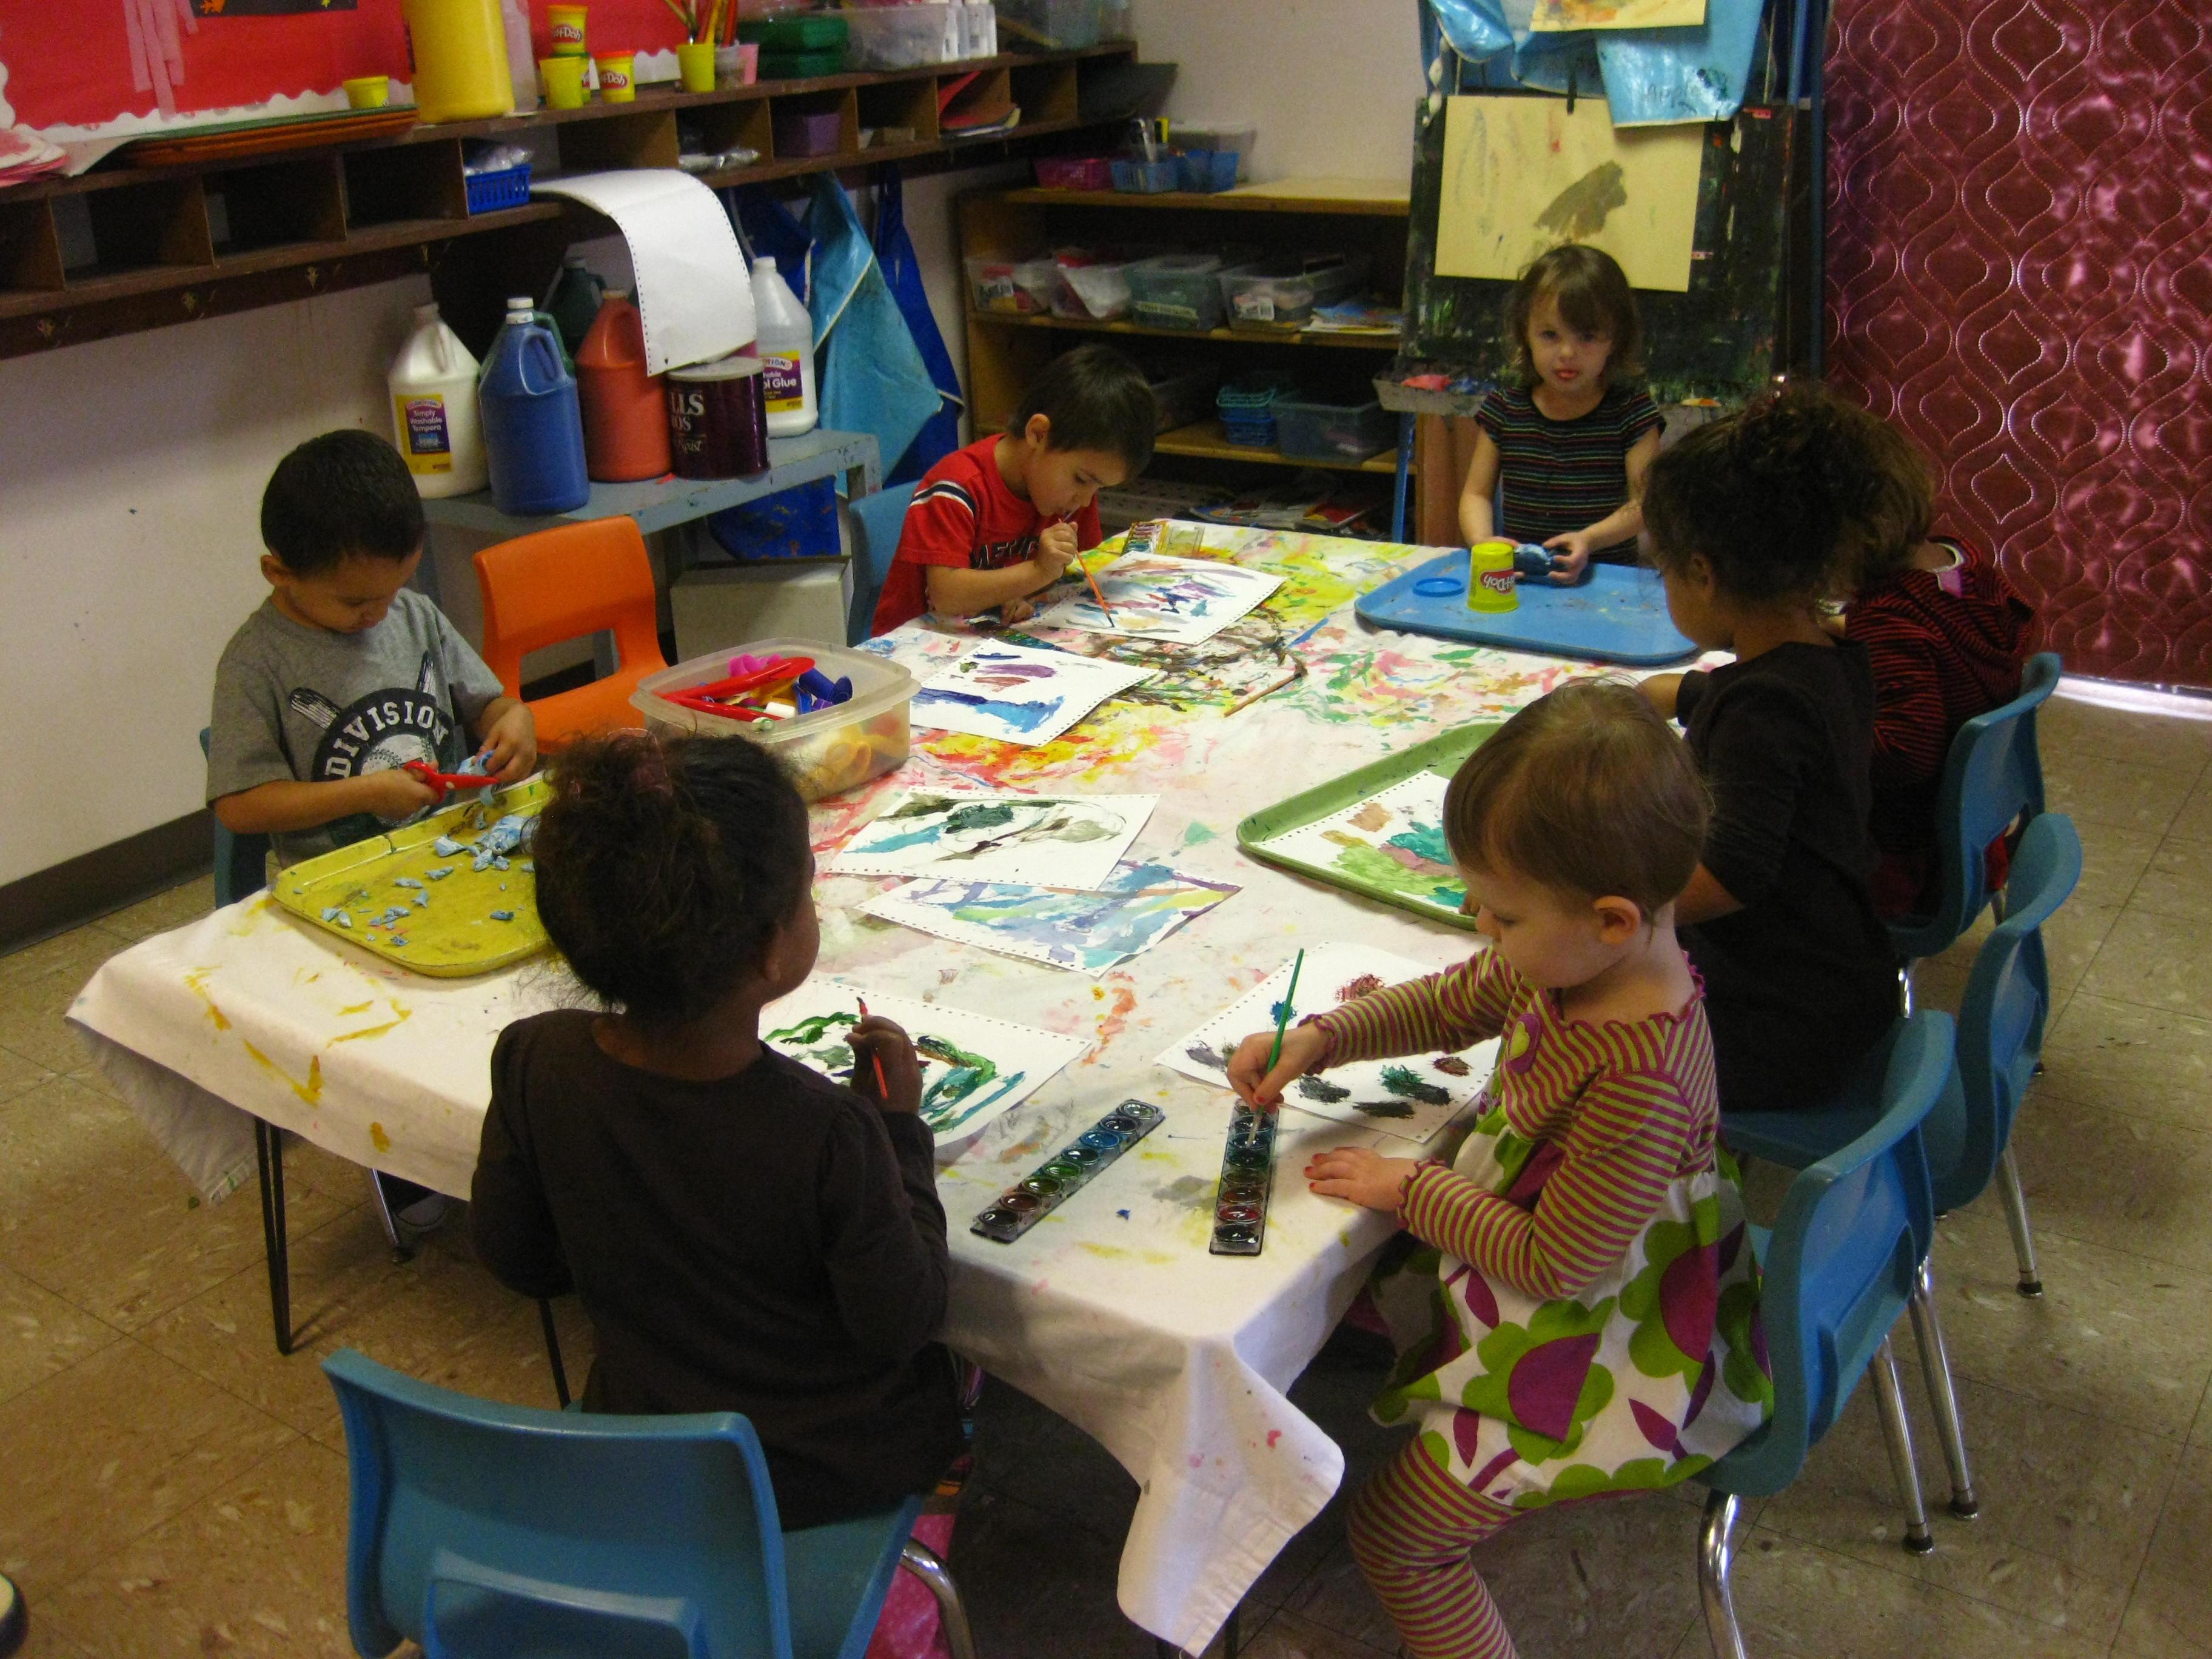 preschool art table. Creative Hands At The Art Table. Preschool Program Table E